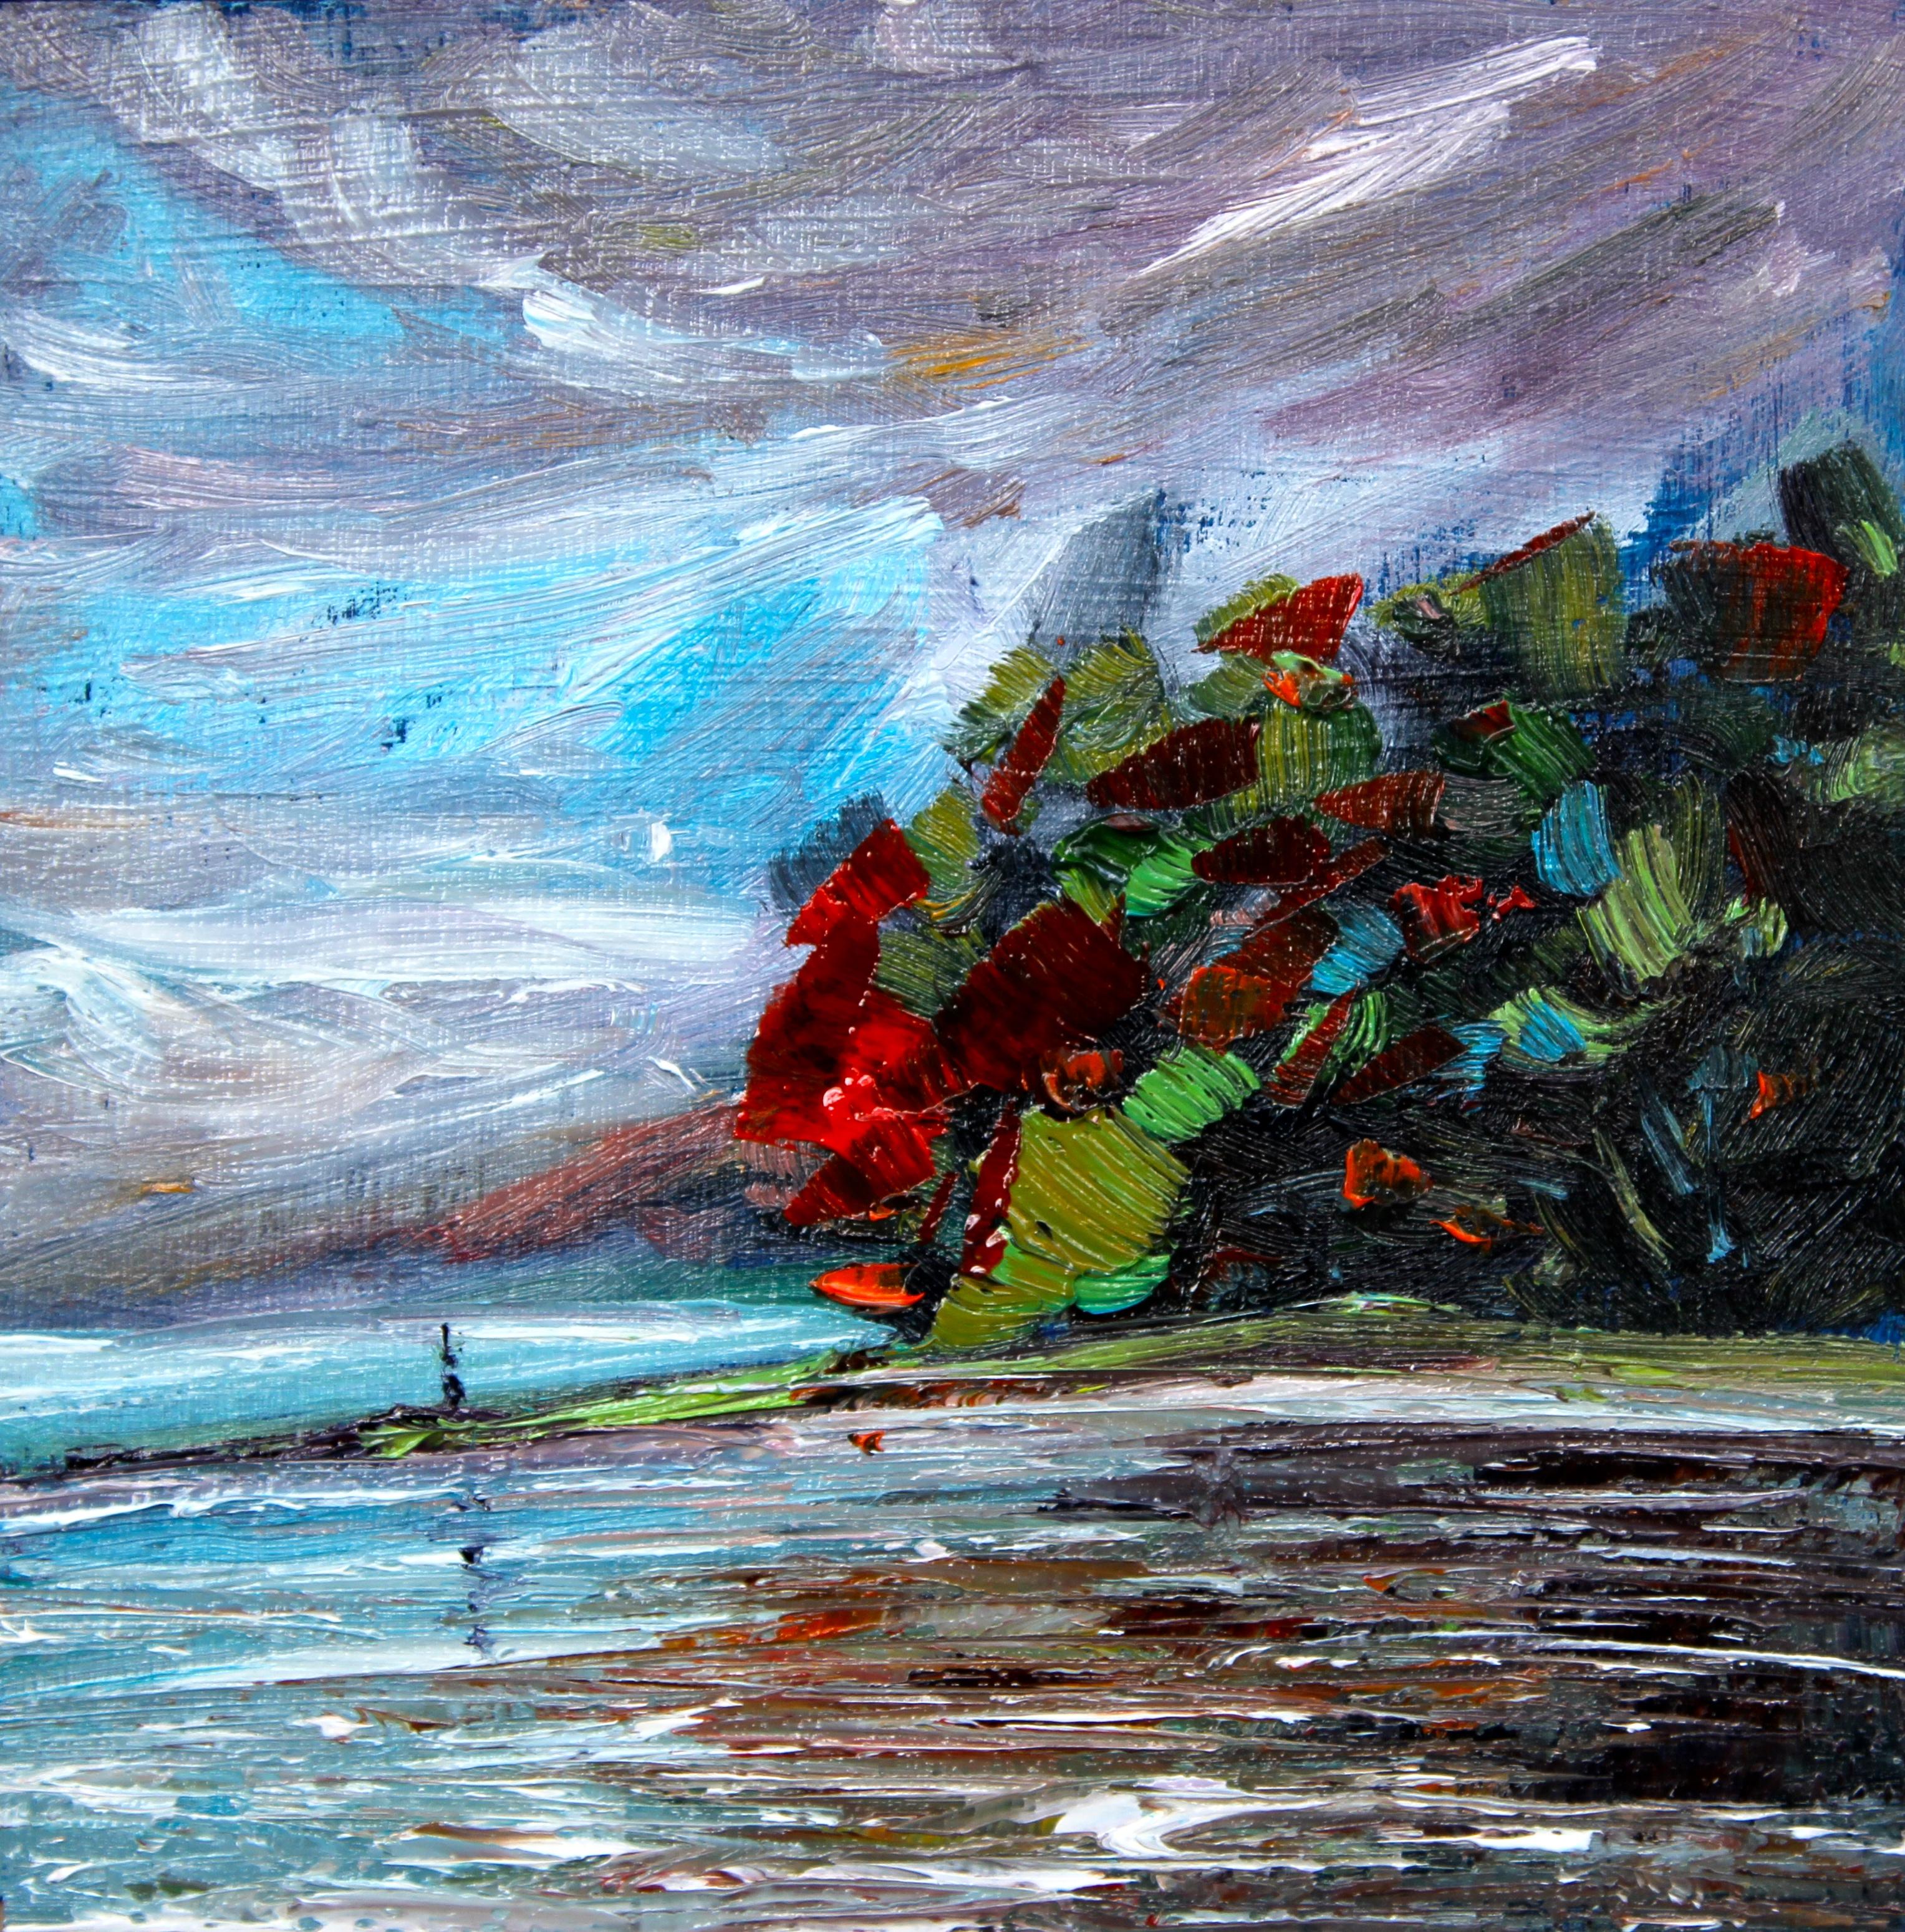 Pleinair painting, helenblairsart